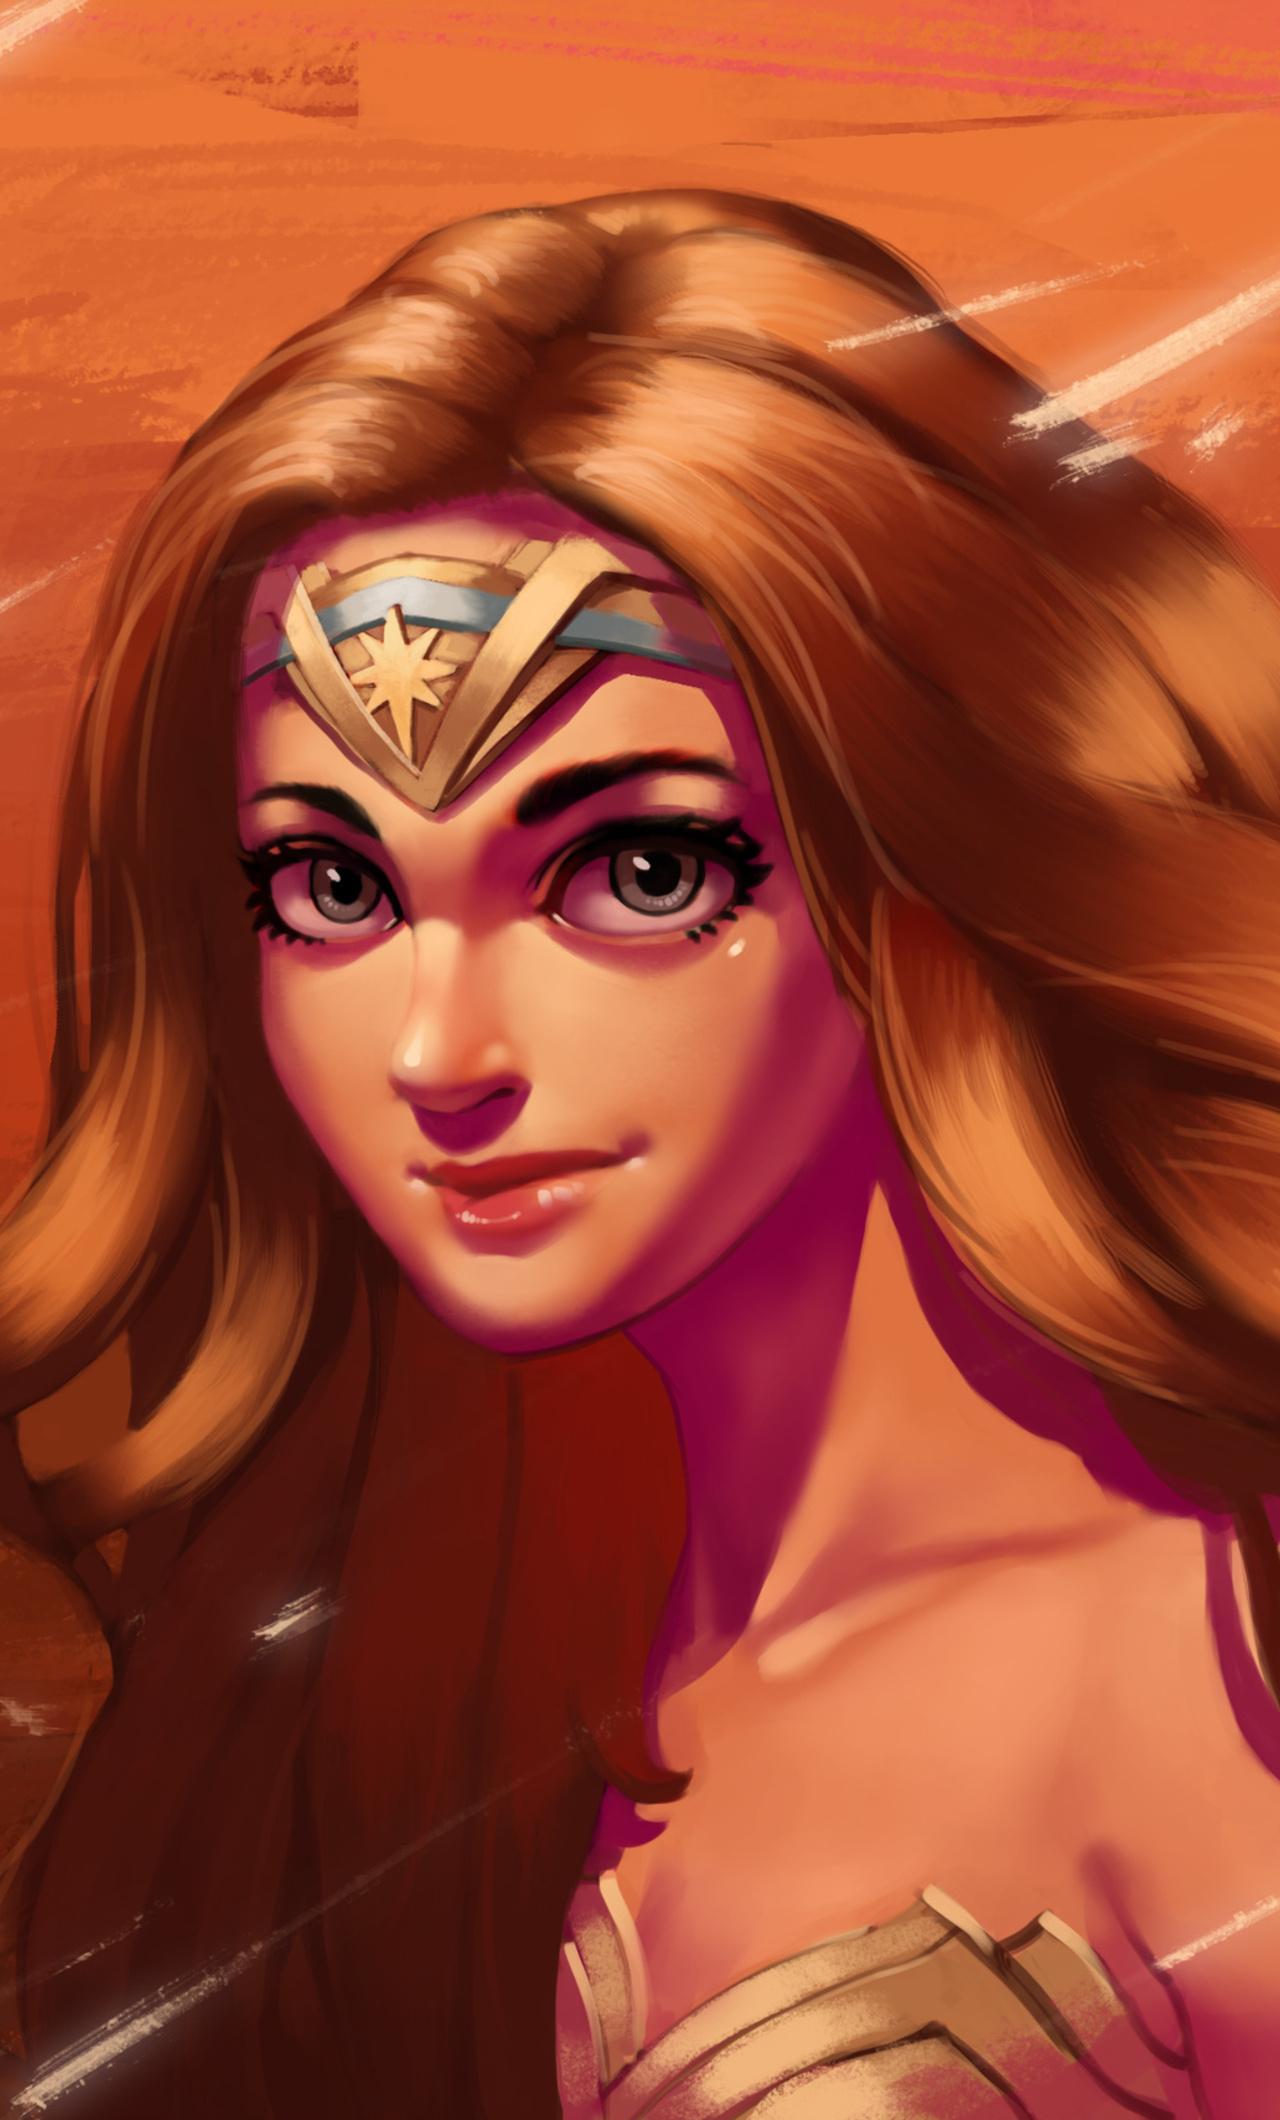 1280x2120 Wonder Woman Cute Art Iphone 6 Hd 4k Wallpapers